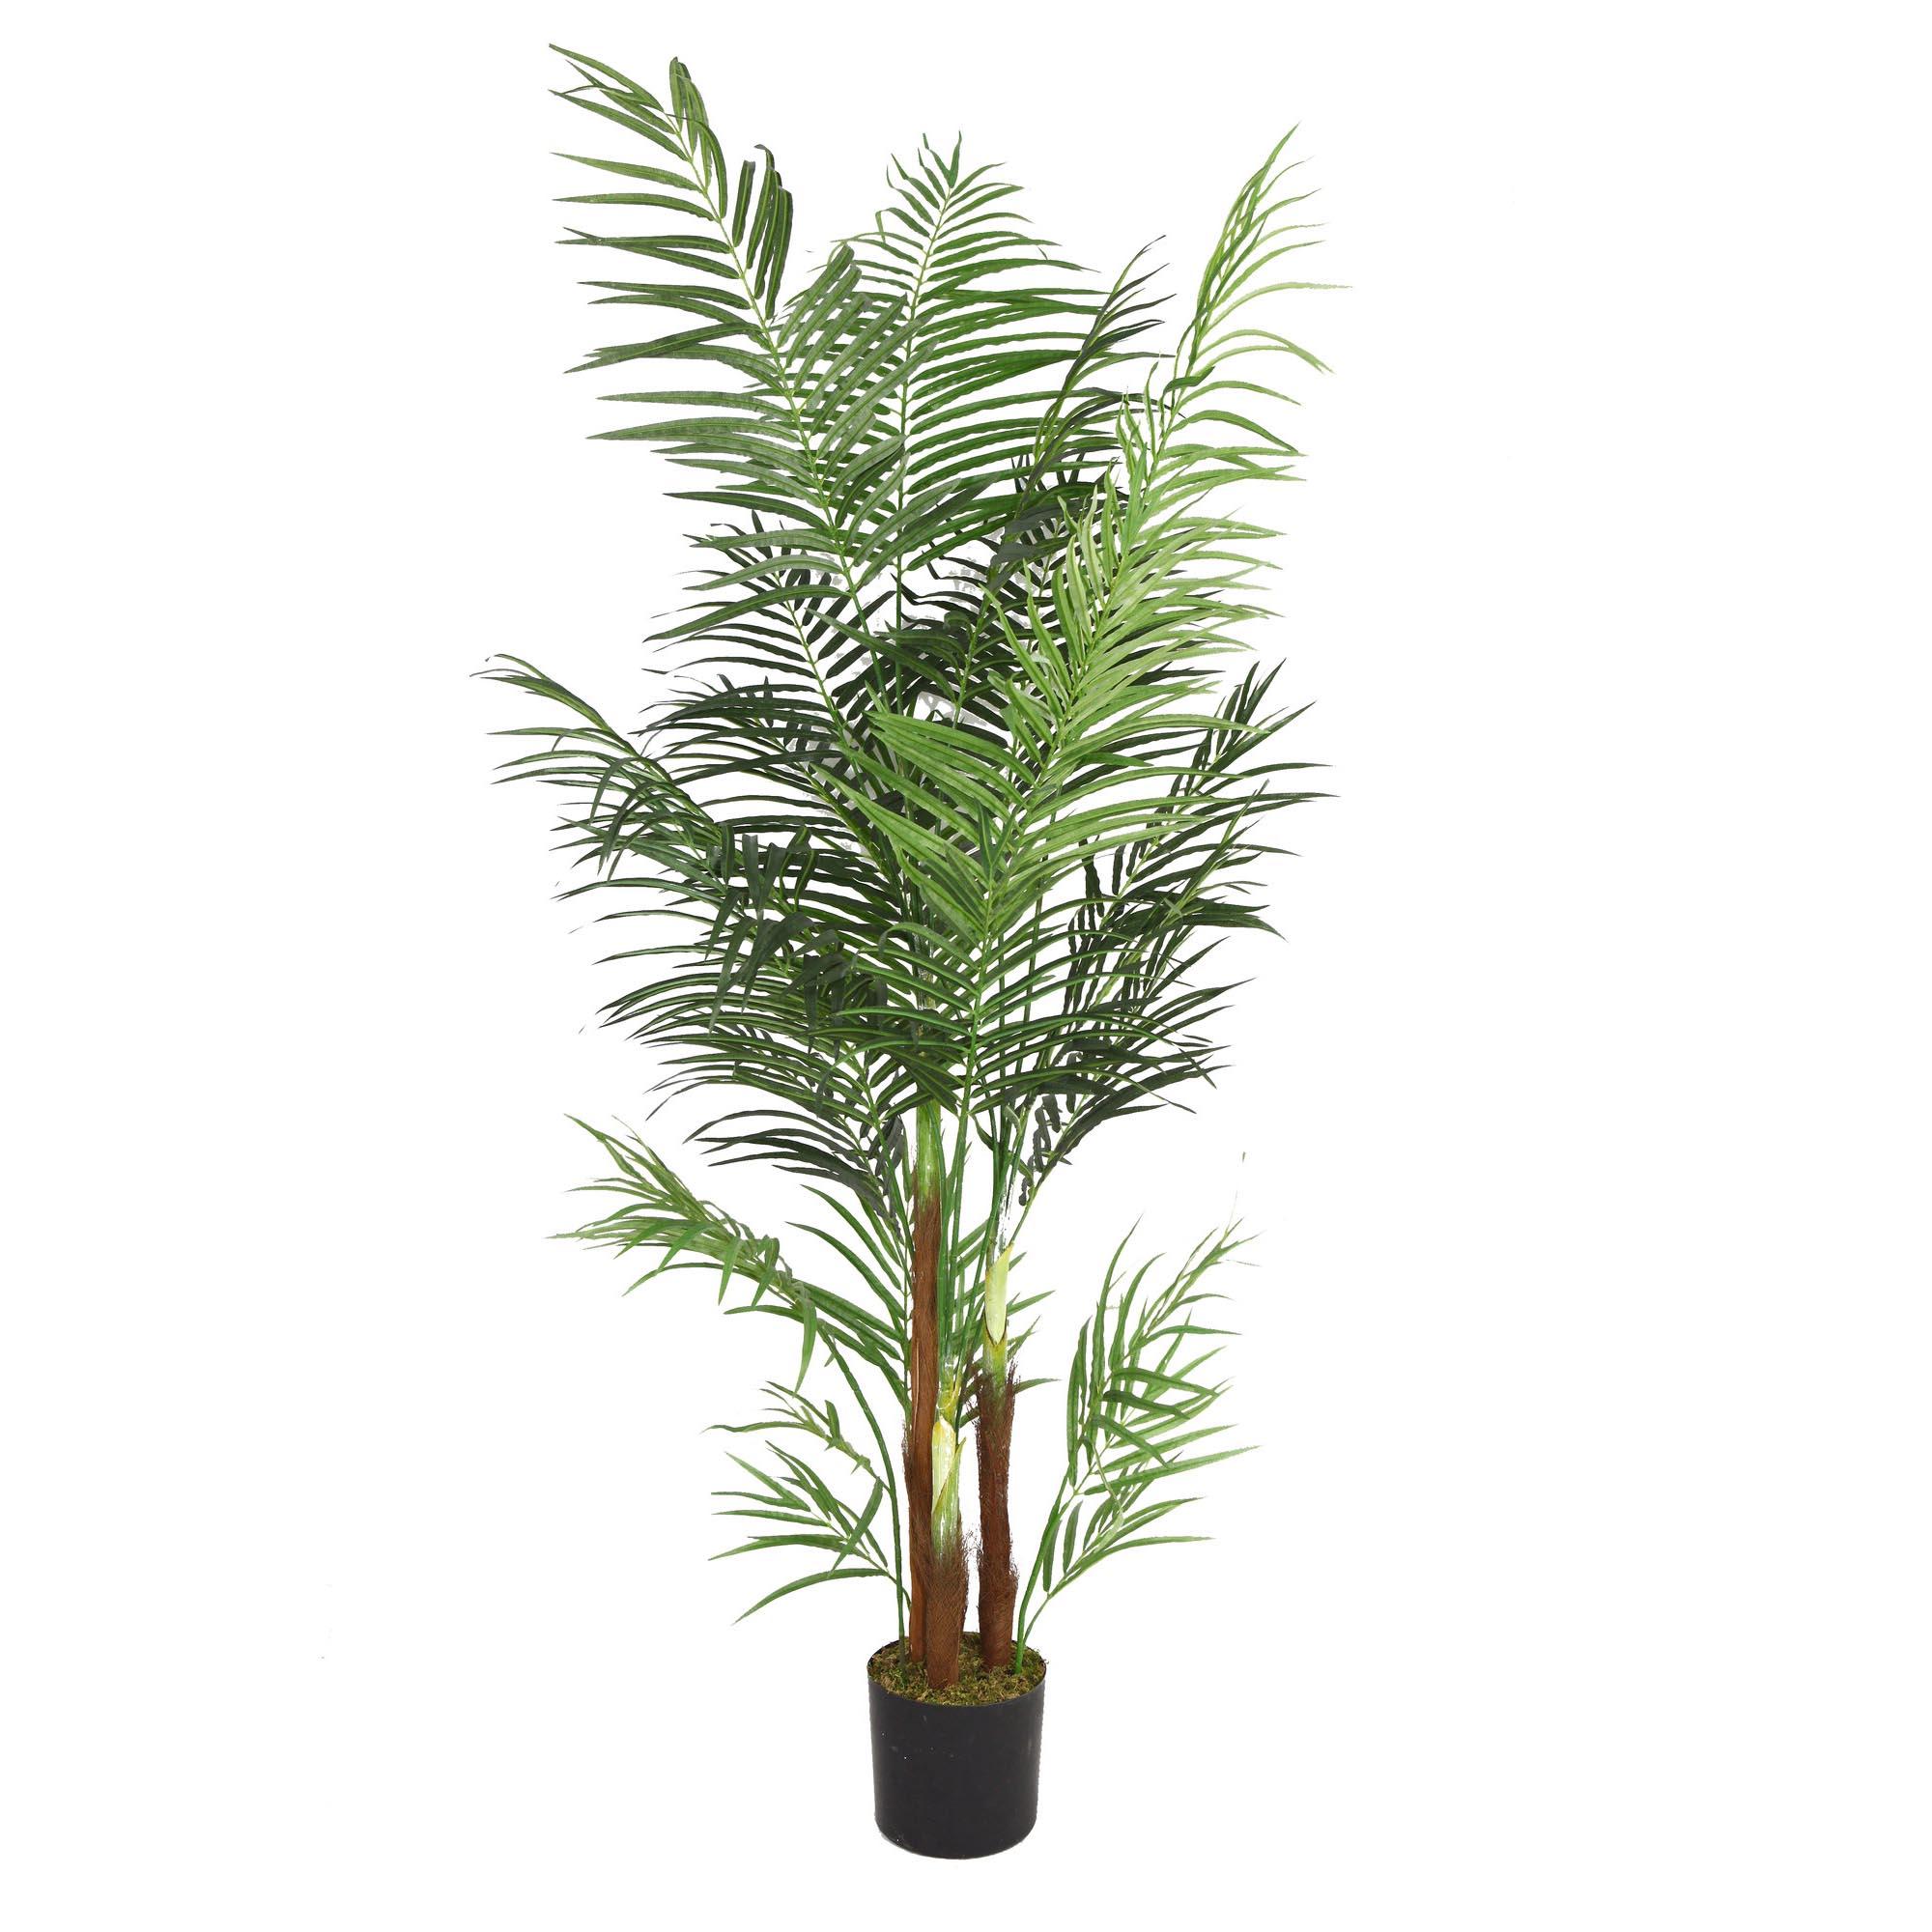 Superb Artificial Areca Palm Tree Product Photo